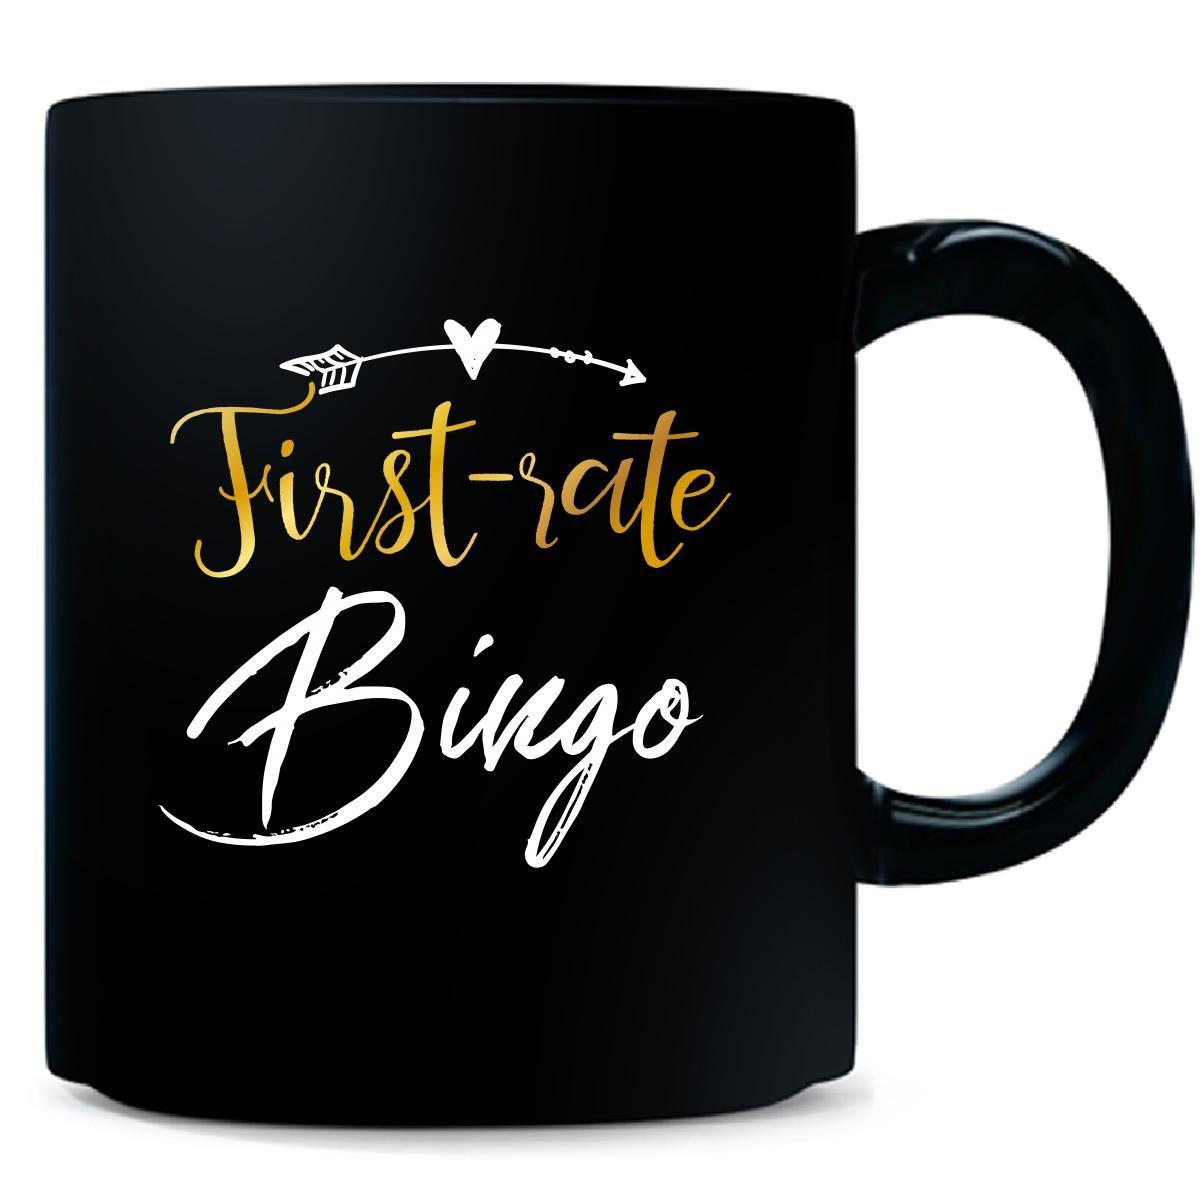 First Rate Bingo Name Mothers Day Present Grandma - Mug